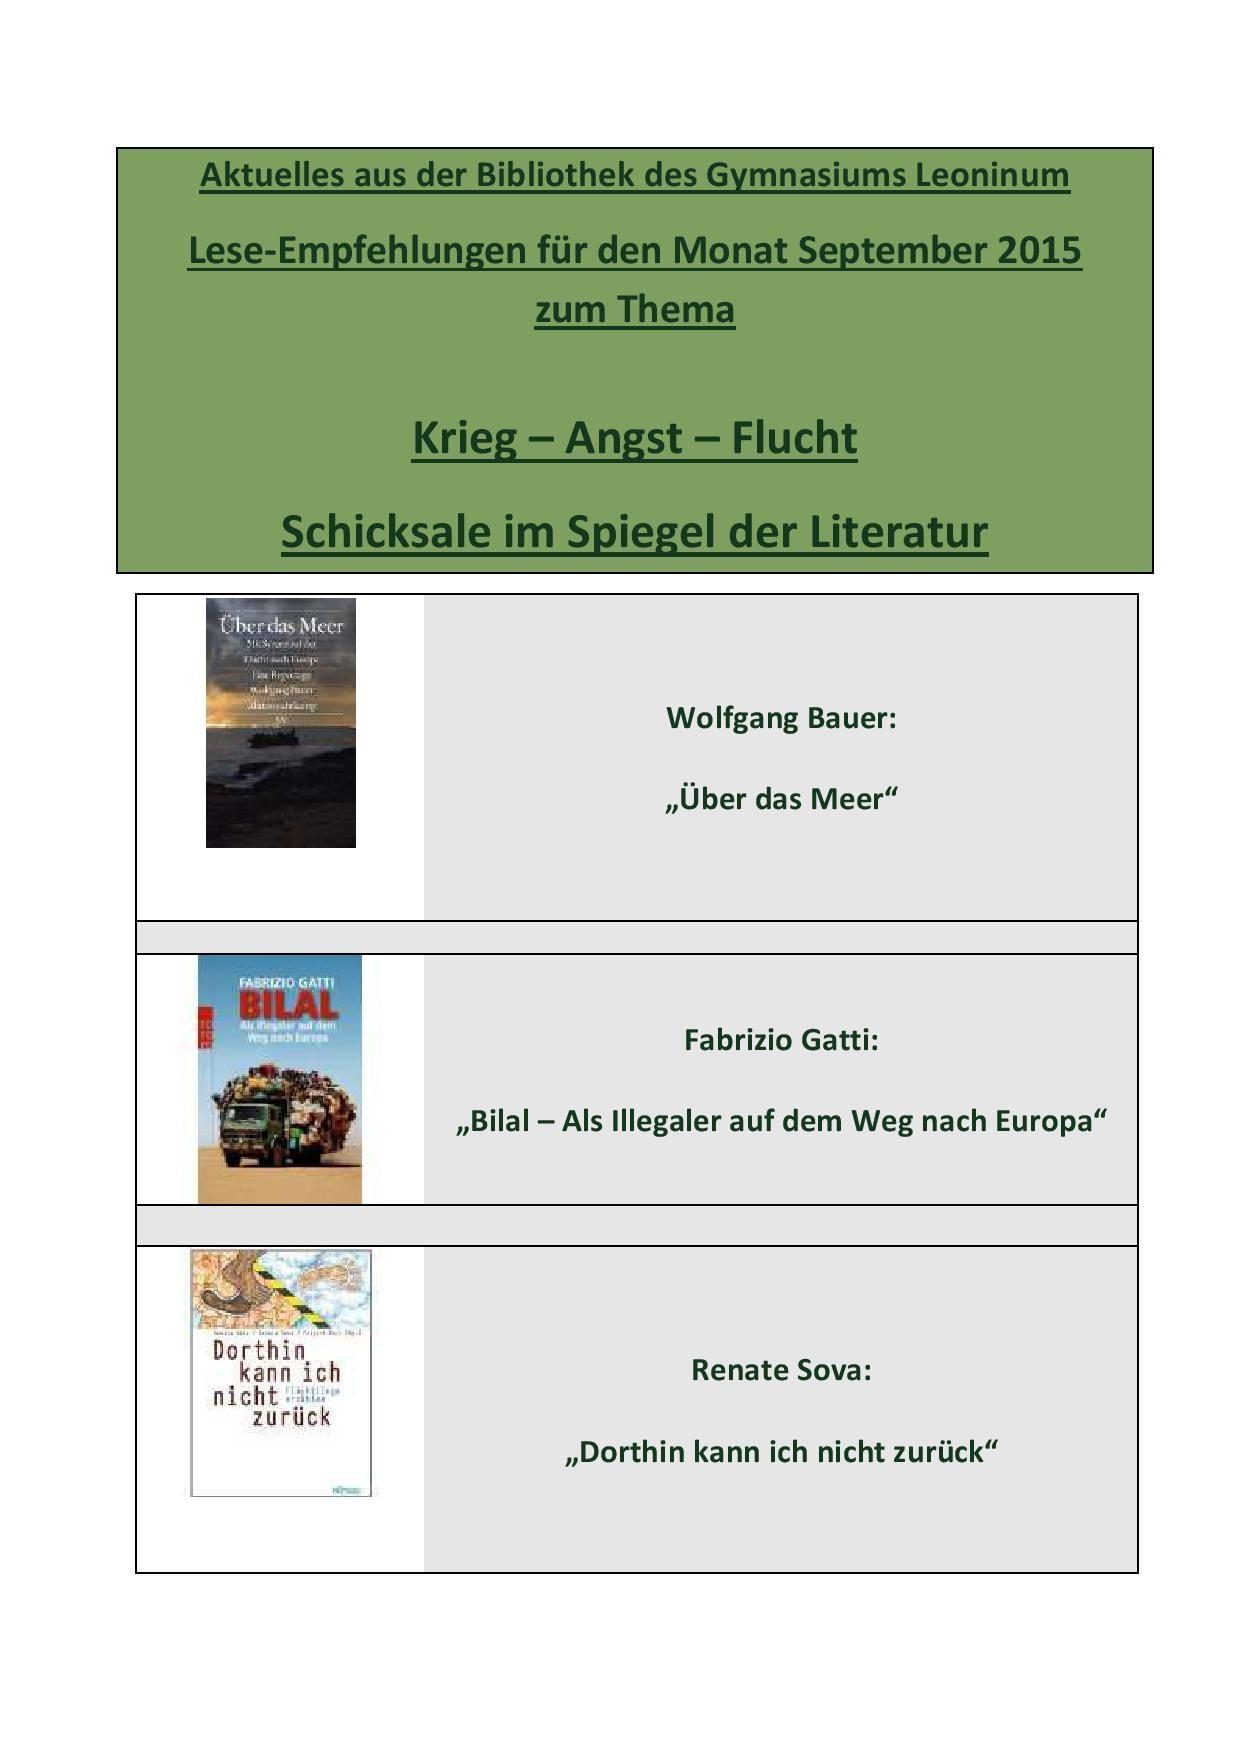 September 2015 - Aktuelles aus der Bibliothek des Gymnasiums Leoninum-page-001